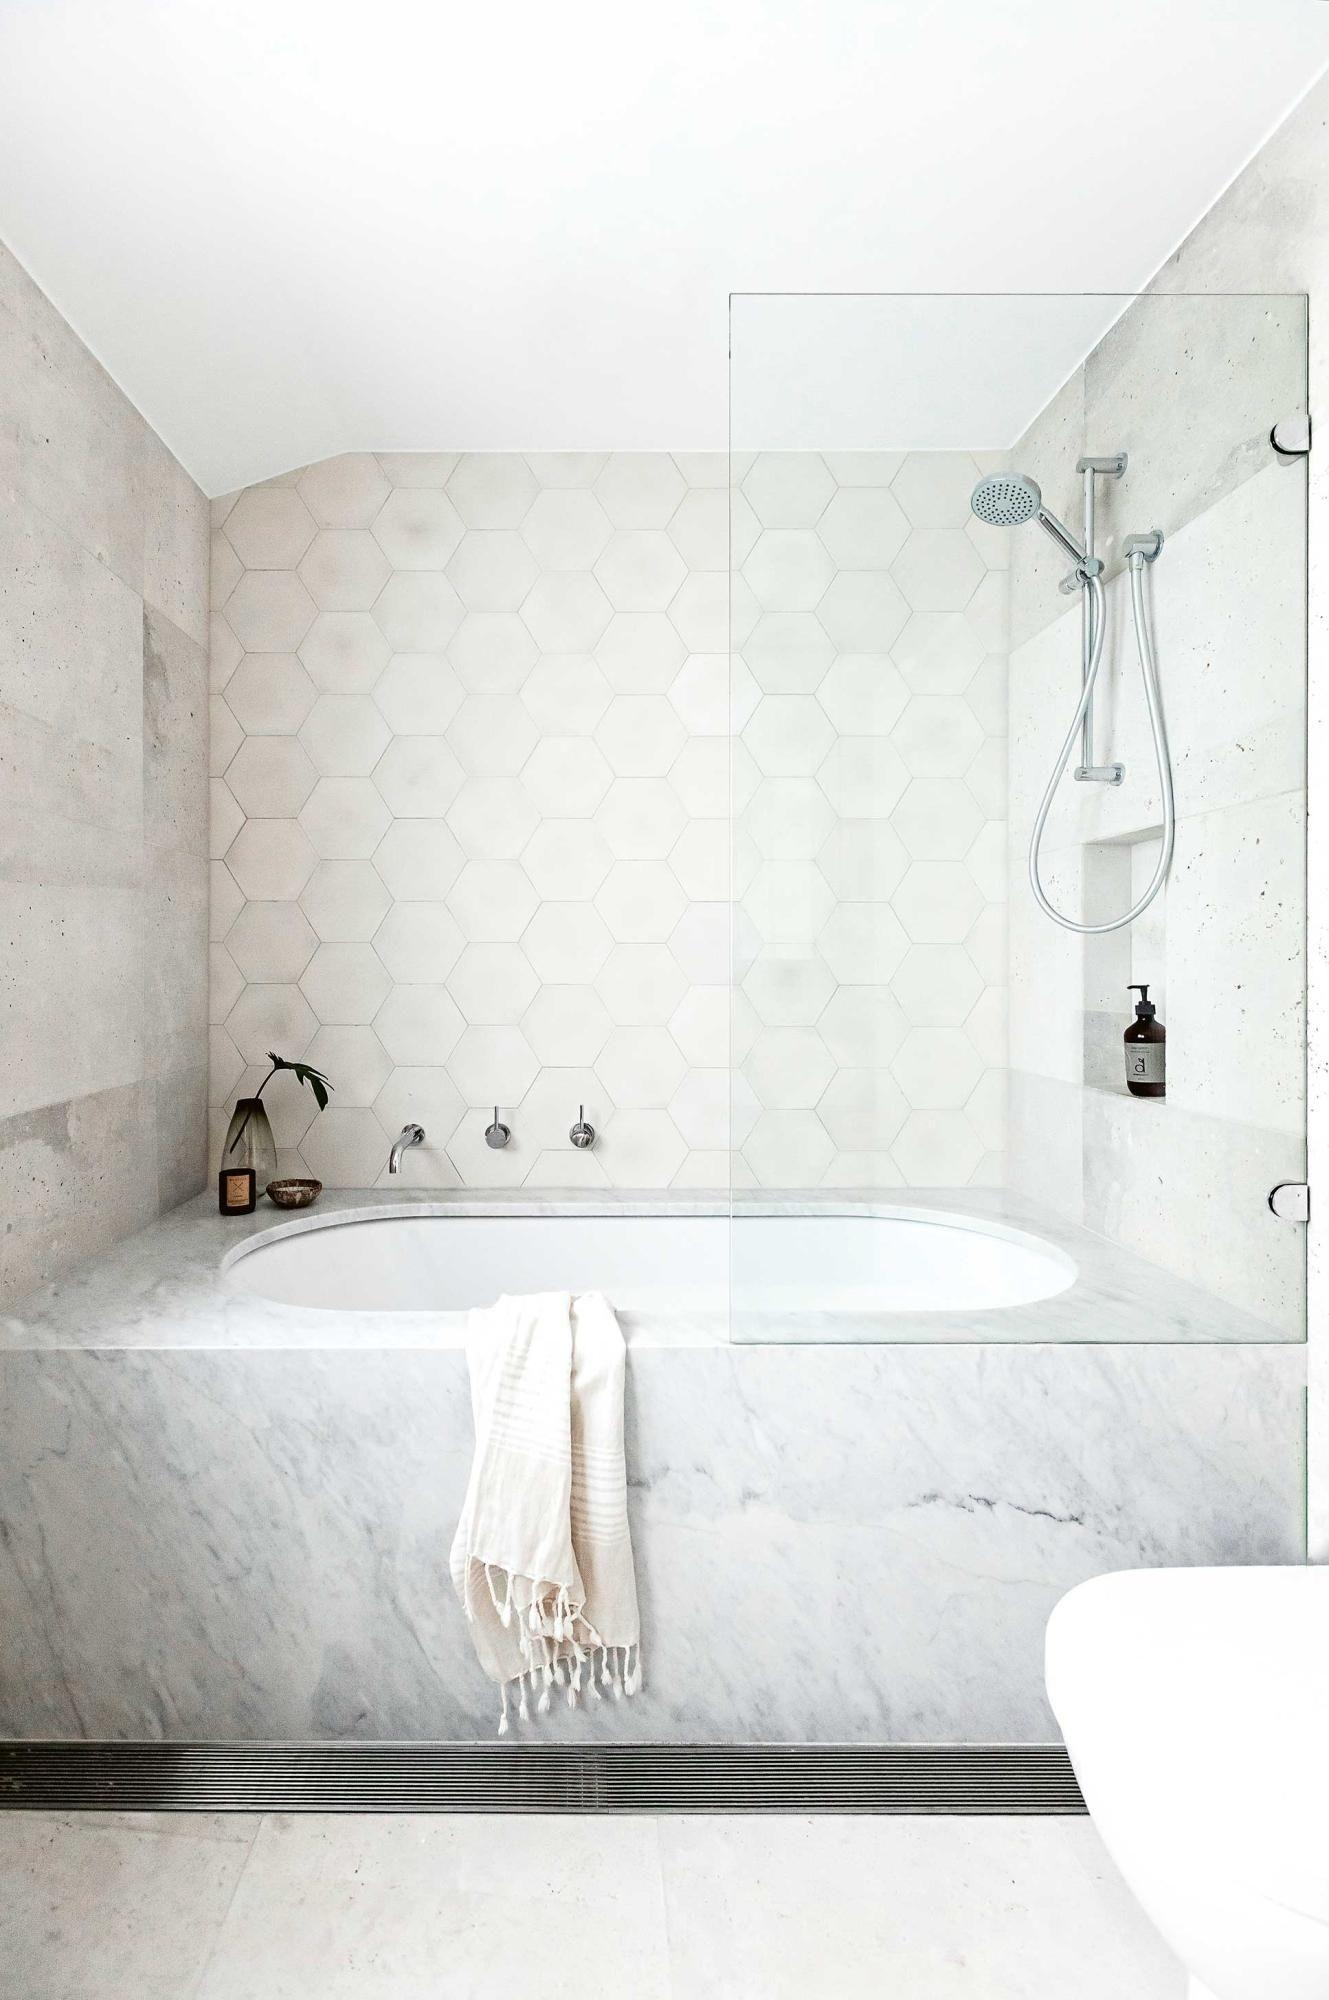 This bathroom uses u0027Uni coloured Hexagonu0027 concrete tiles